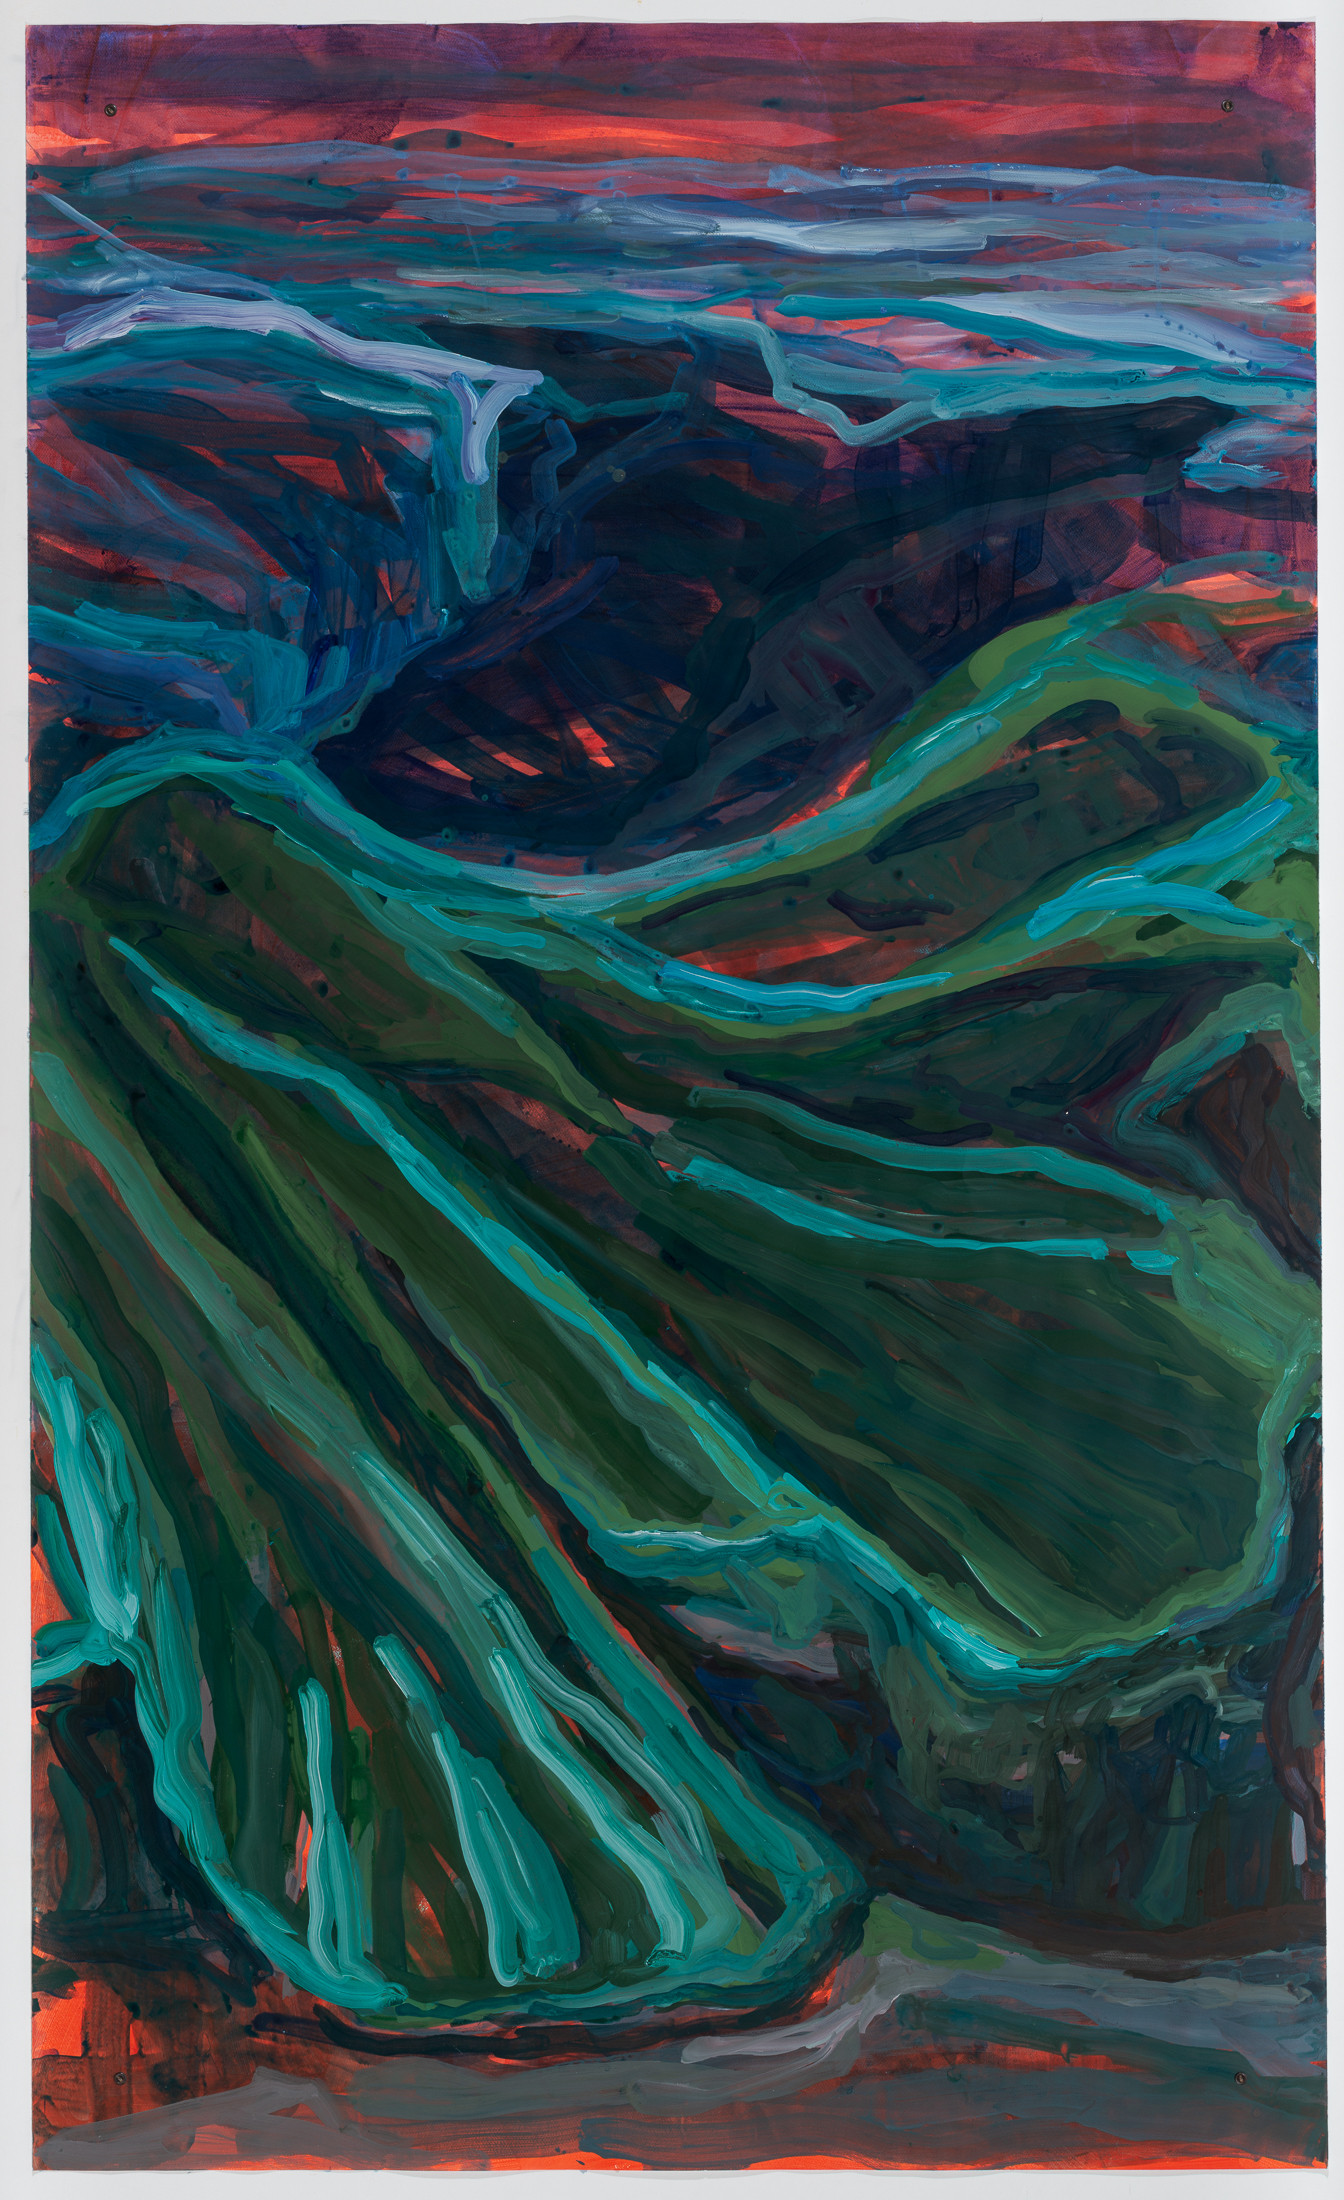 Liquid Sand, acrylic on watercolor paper, 250 x 150 cm DMF 2020